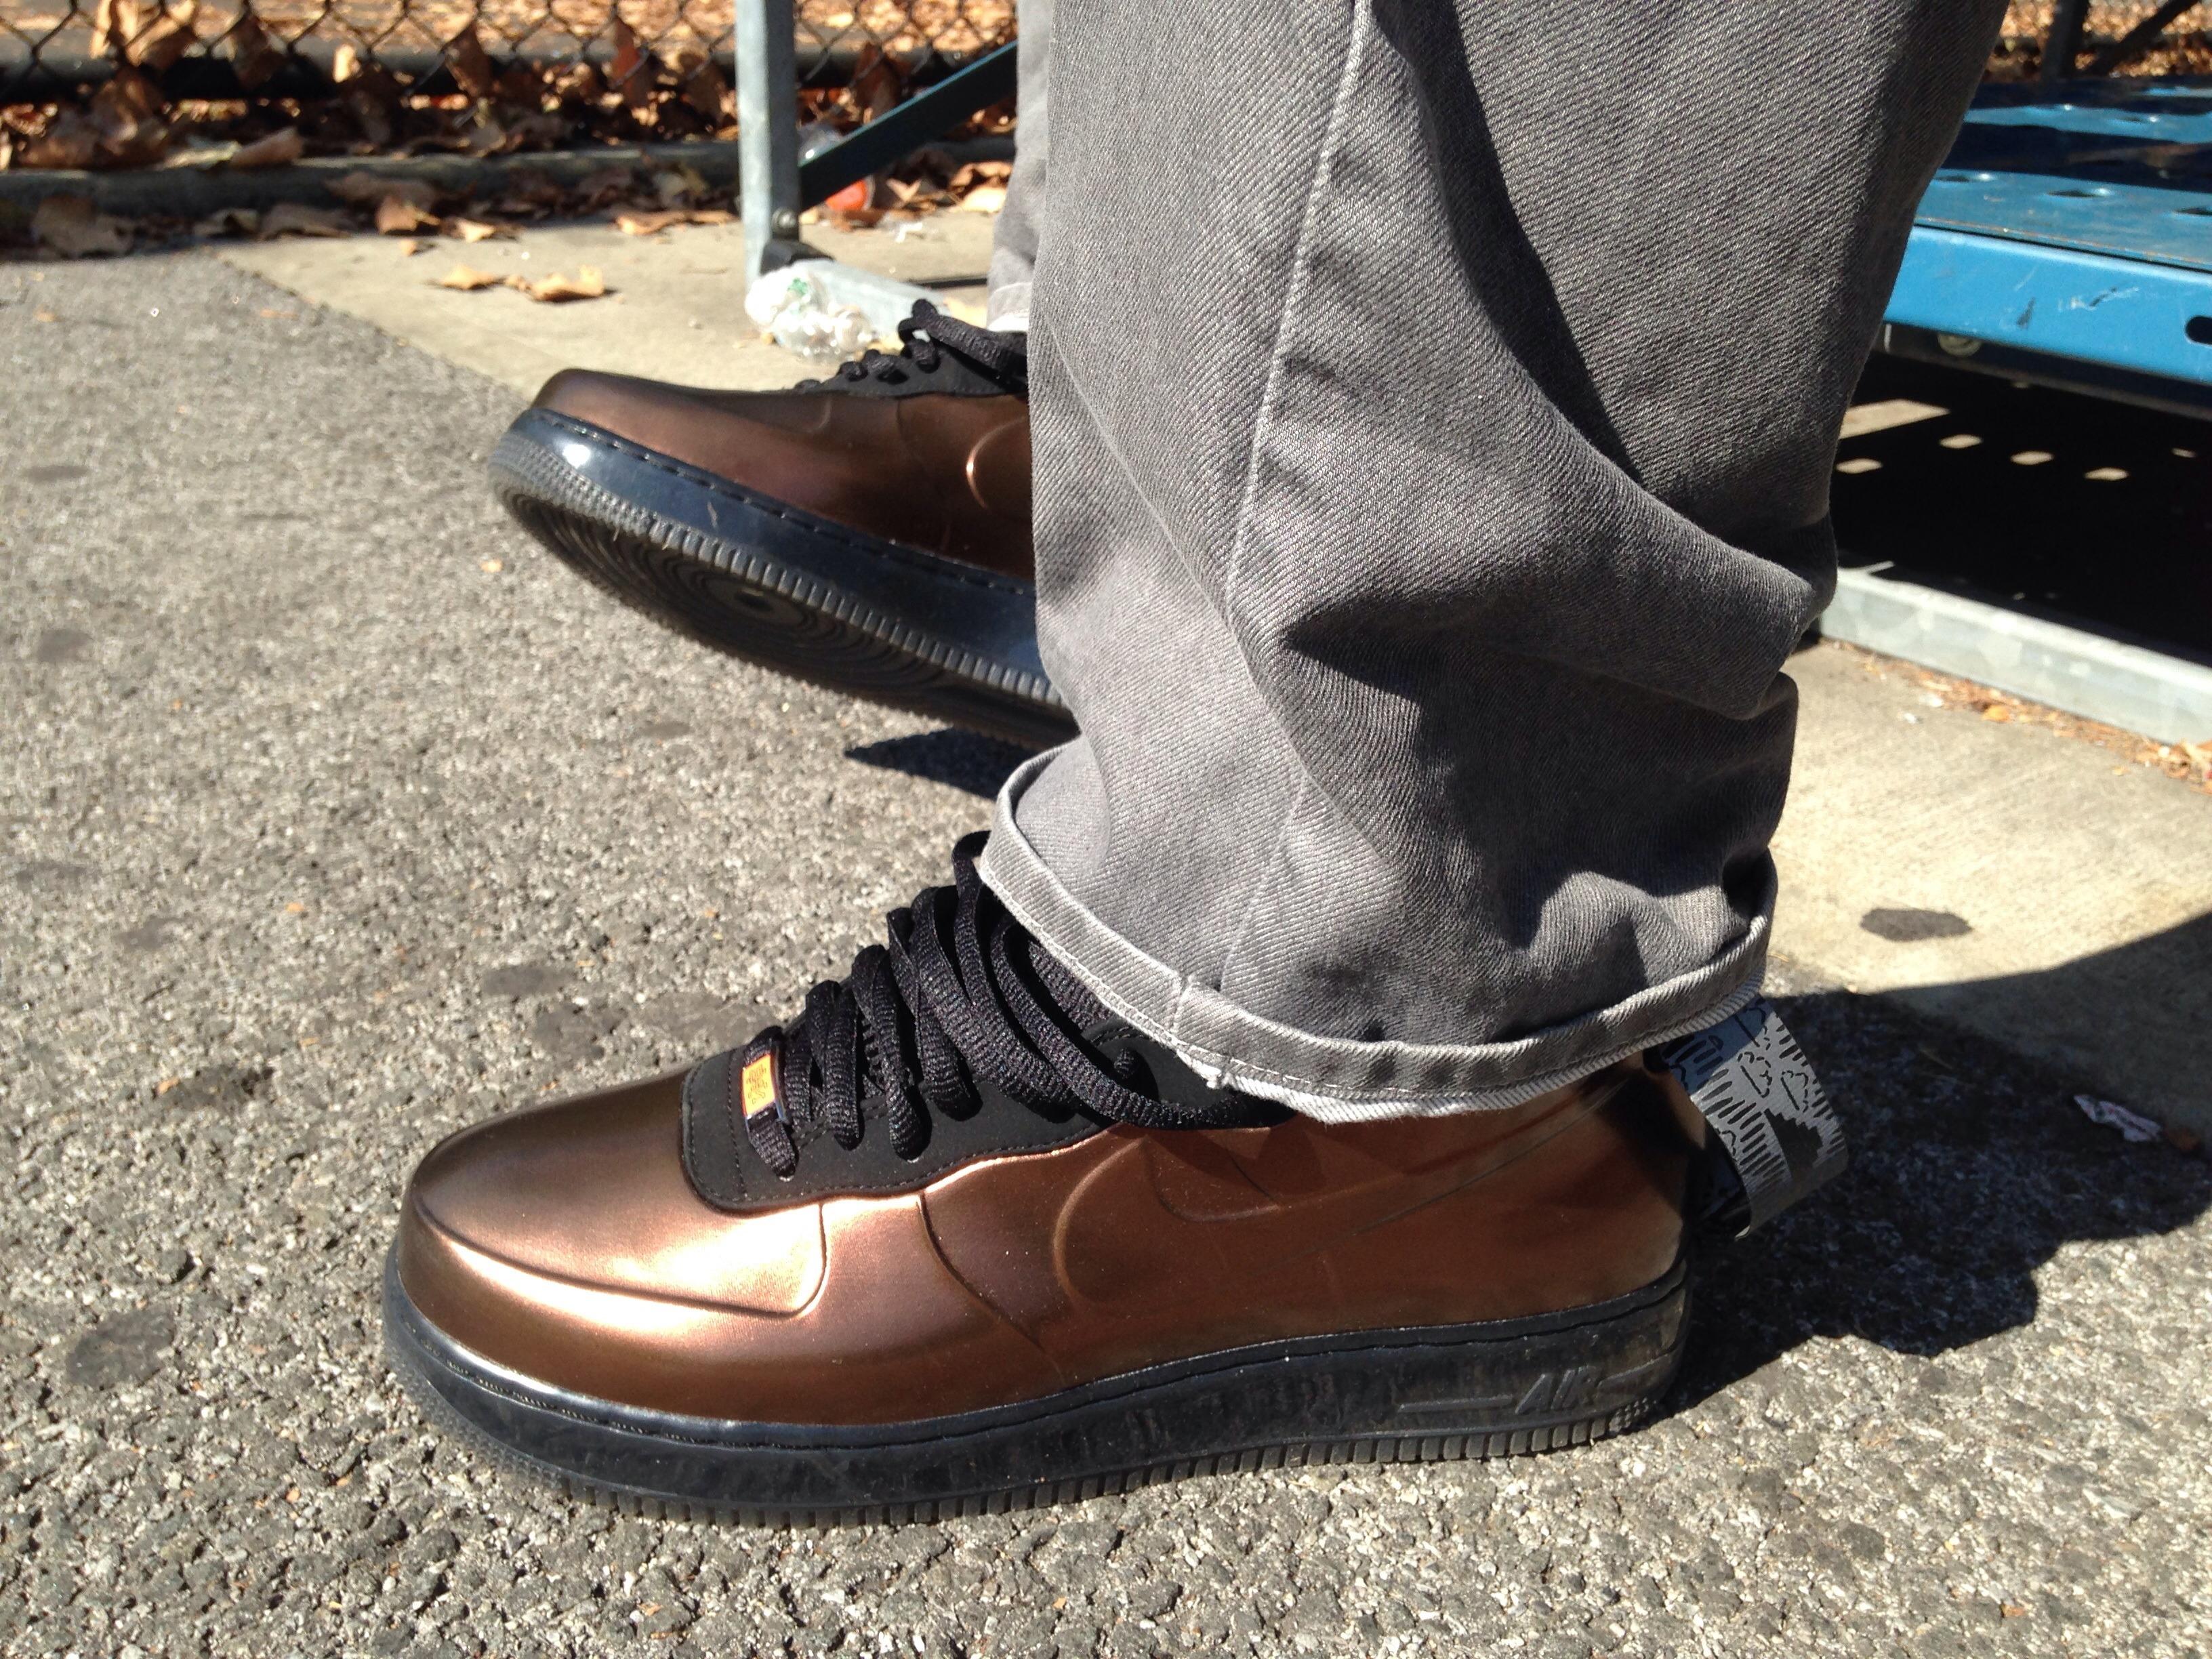 free images shoe sport leather running run walk